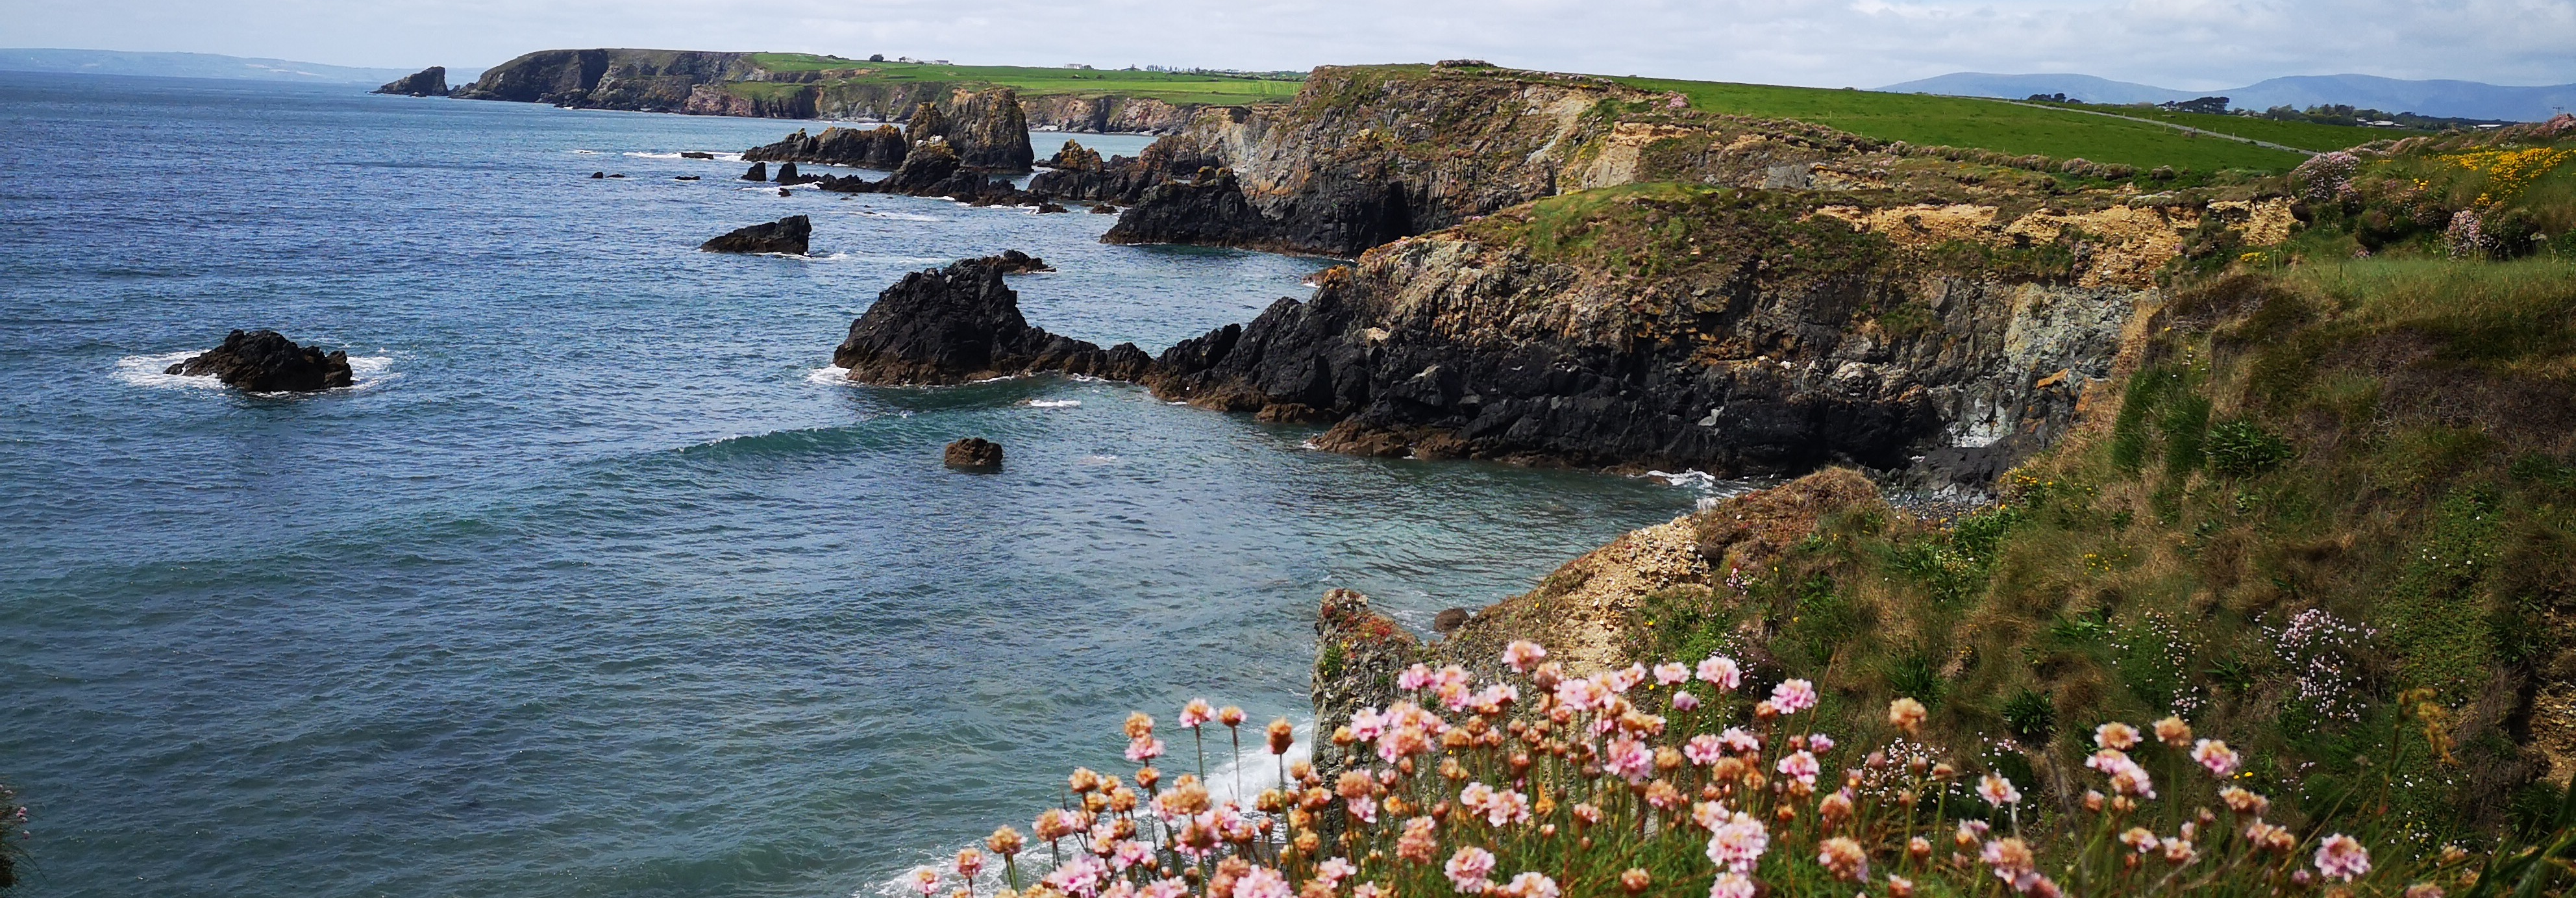 Walk, coastal, Dunmore East, Waterford, Greenway, Ireland, Camino, path, pilgrim